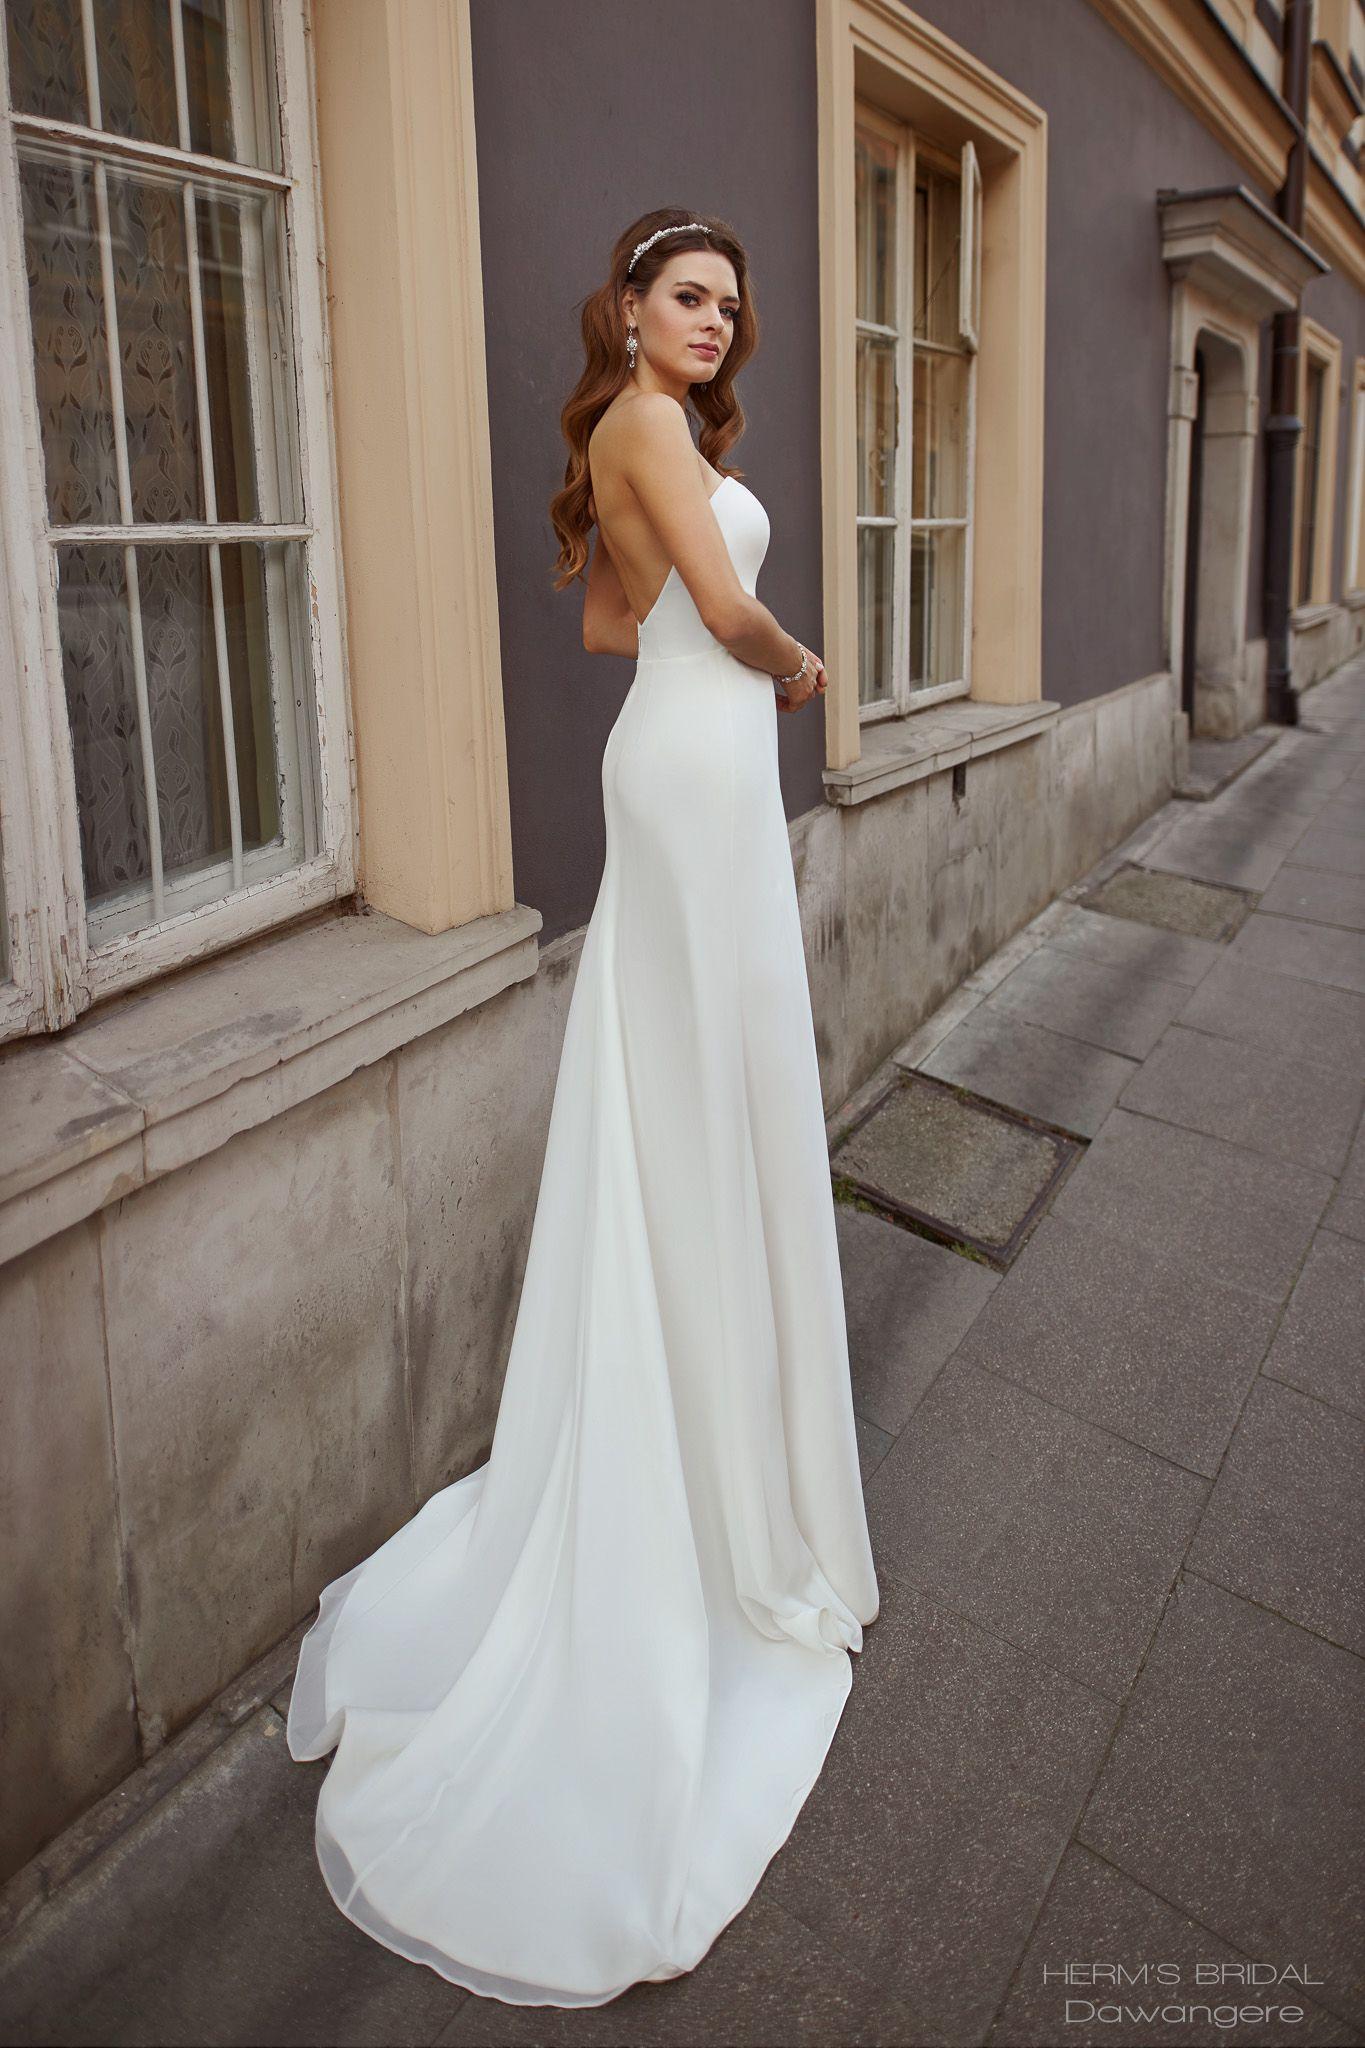 suknia slubna herms bridal Dawangere 2